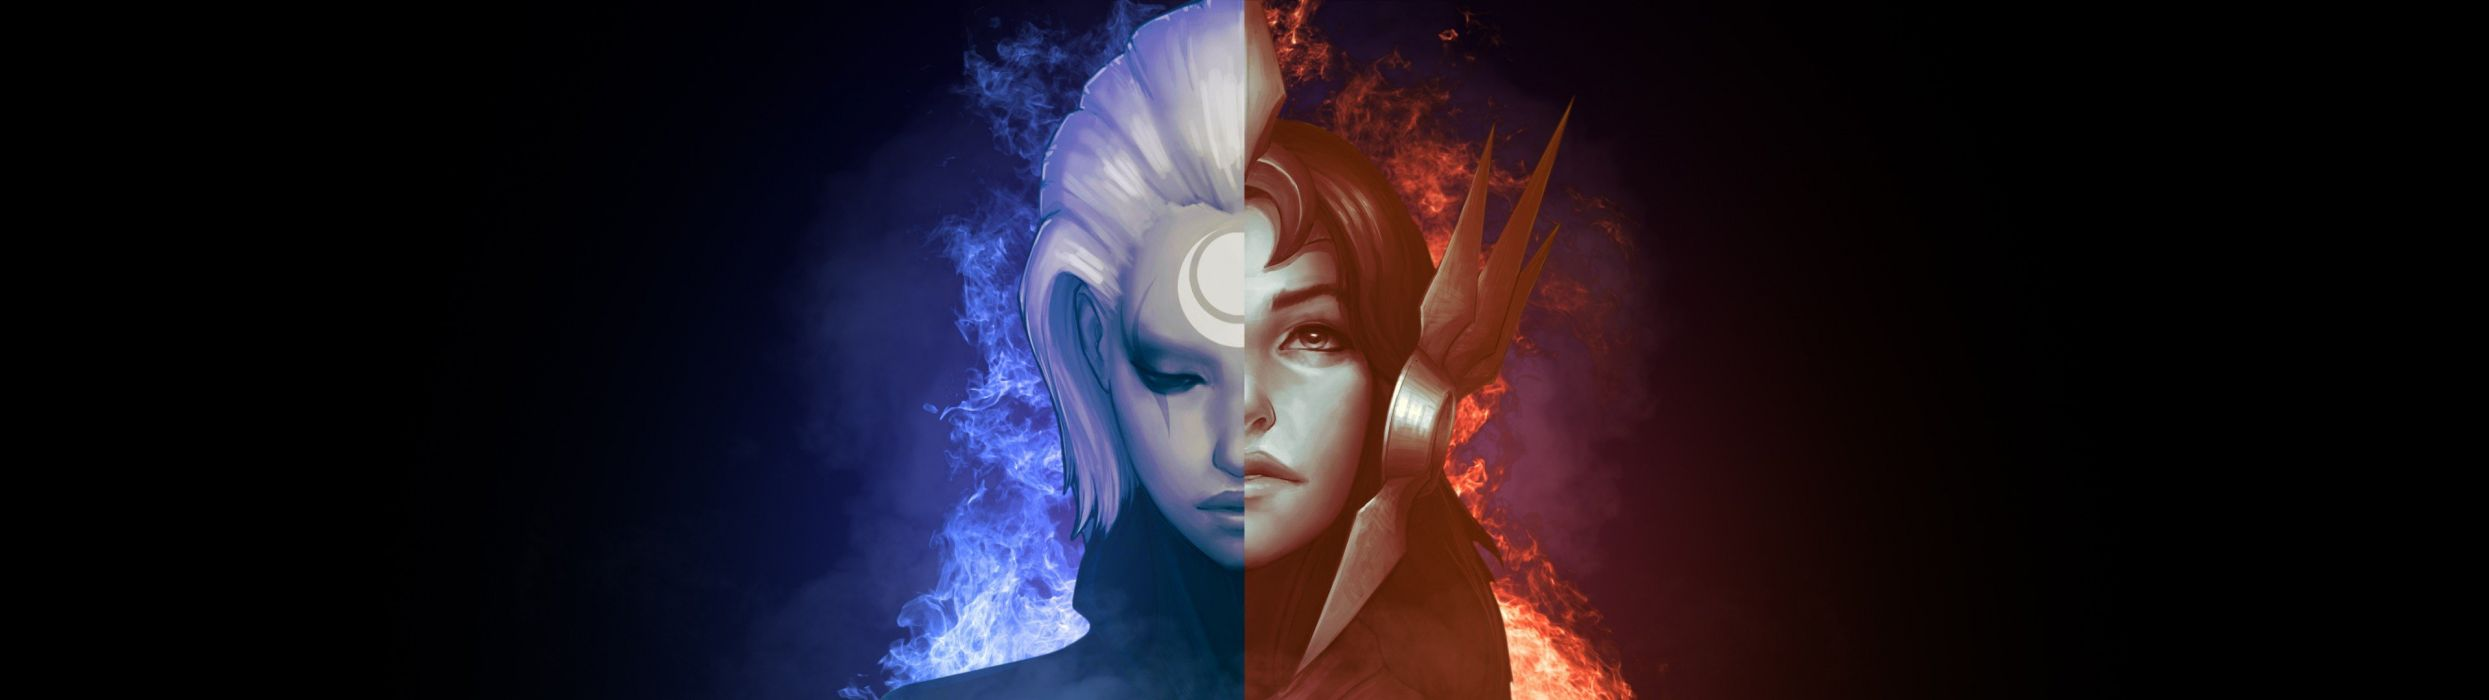 League Of Legends Leona Diana Wallpaper 3840x1080 243194